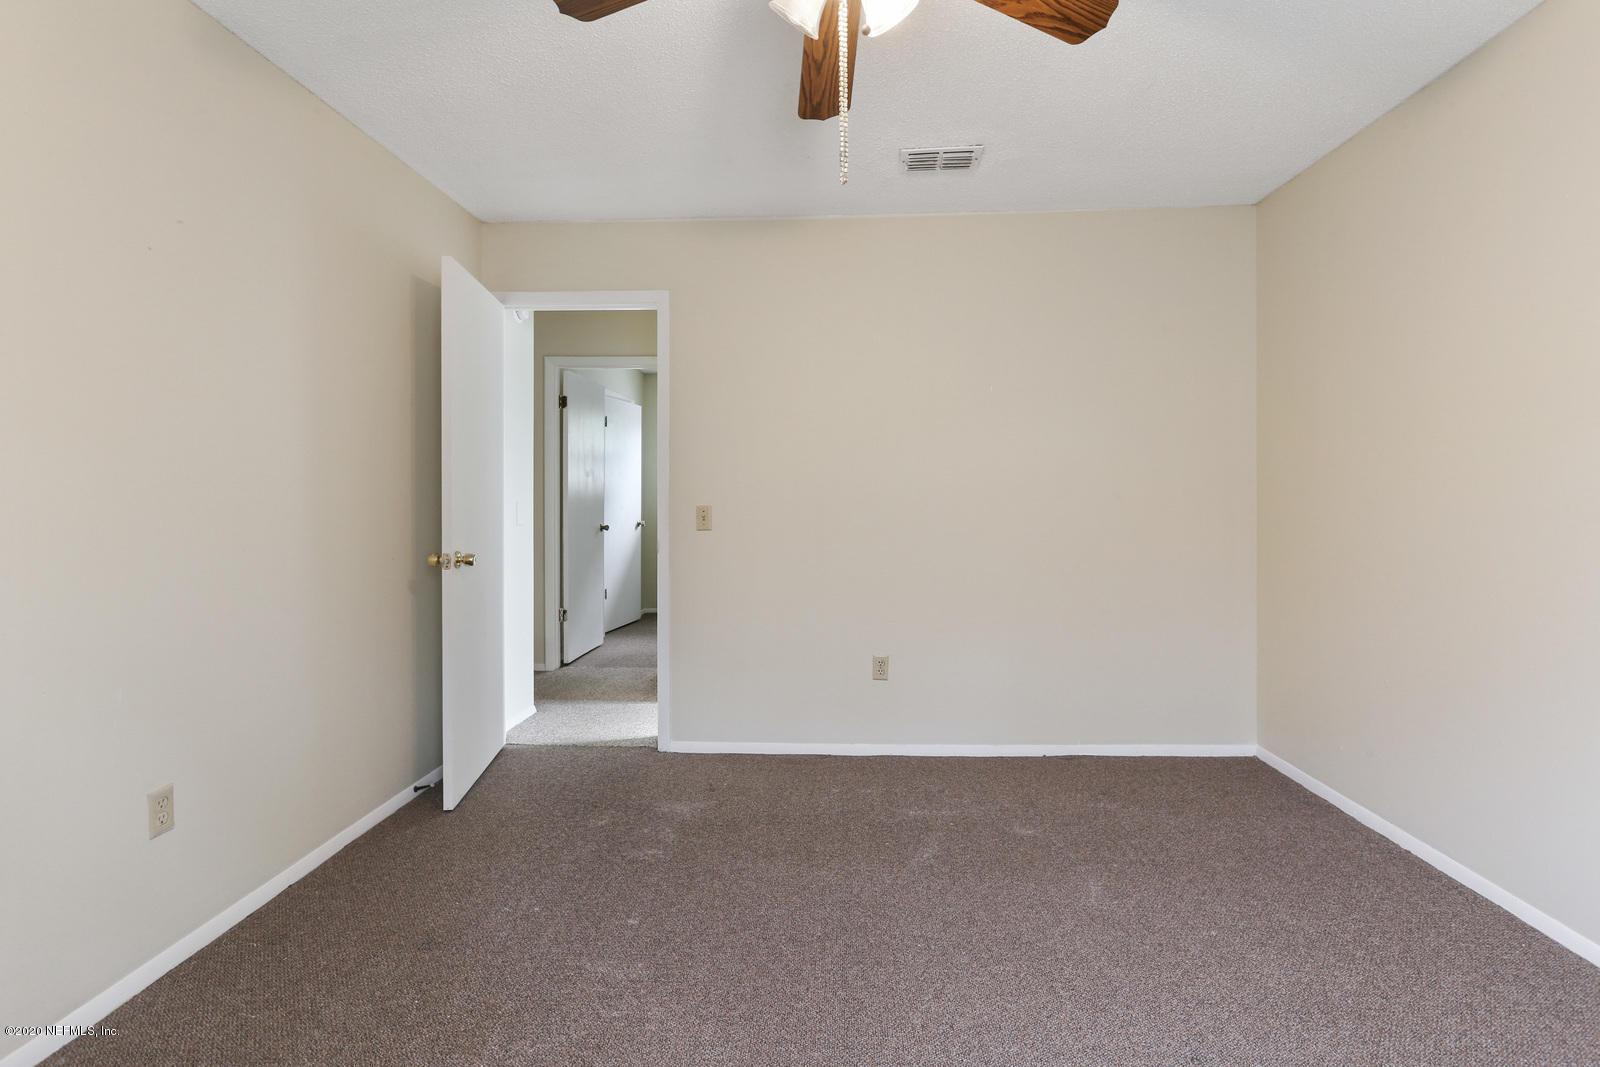 925 STOCKS, ATLANTIC BEACH, FLORIDA 32233, 2 Bedrooms Bedrooms, ,1 BathroomBathrooms,Rental,For Rent,STOCKS,1082387